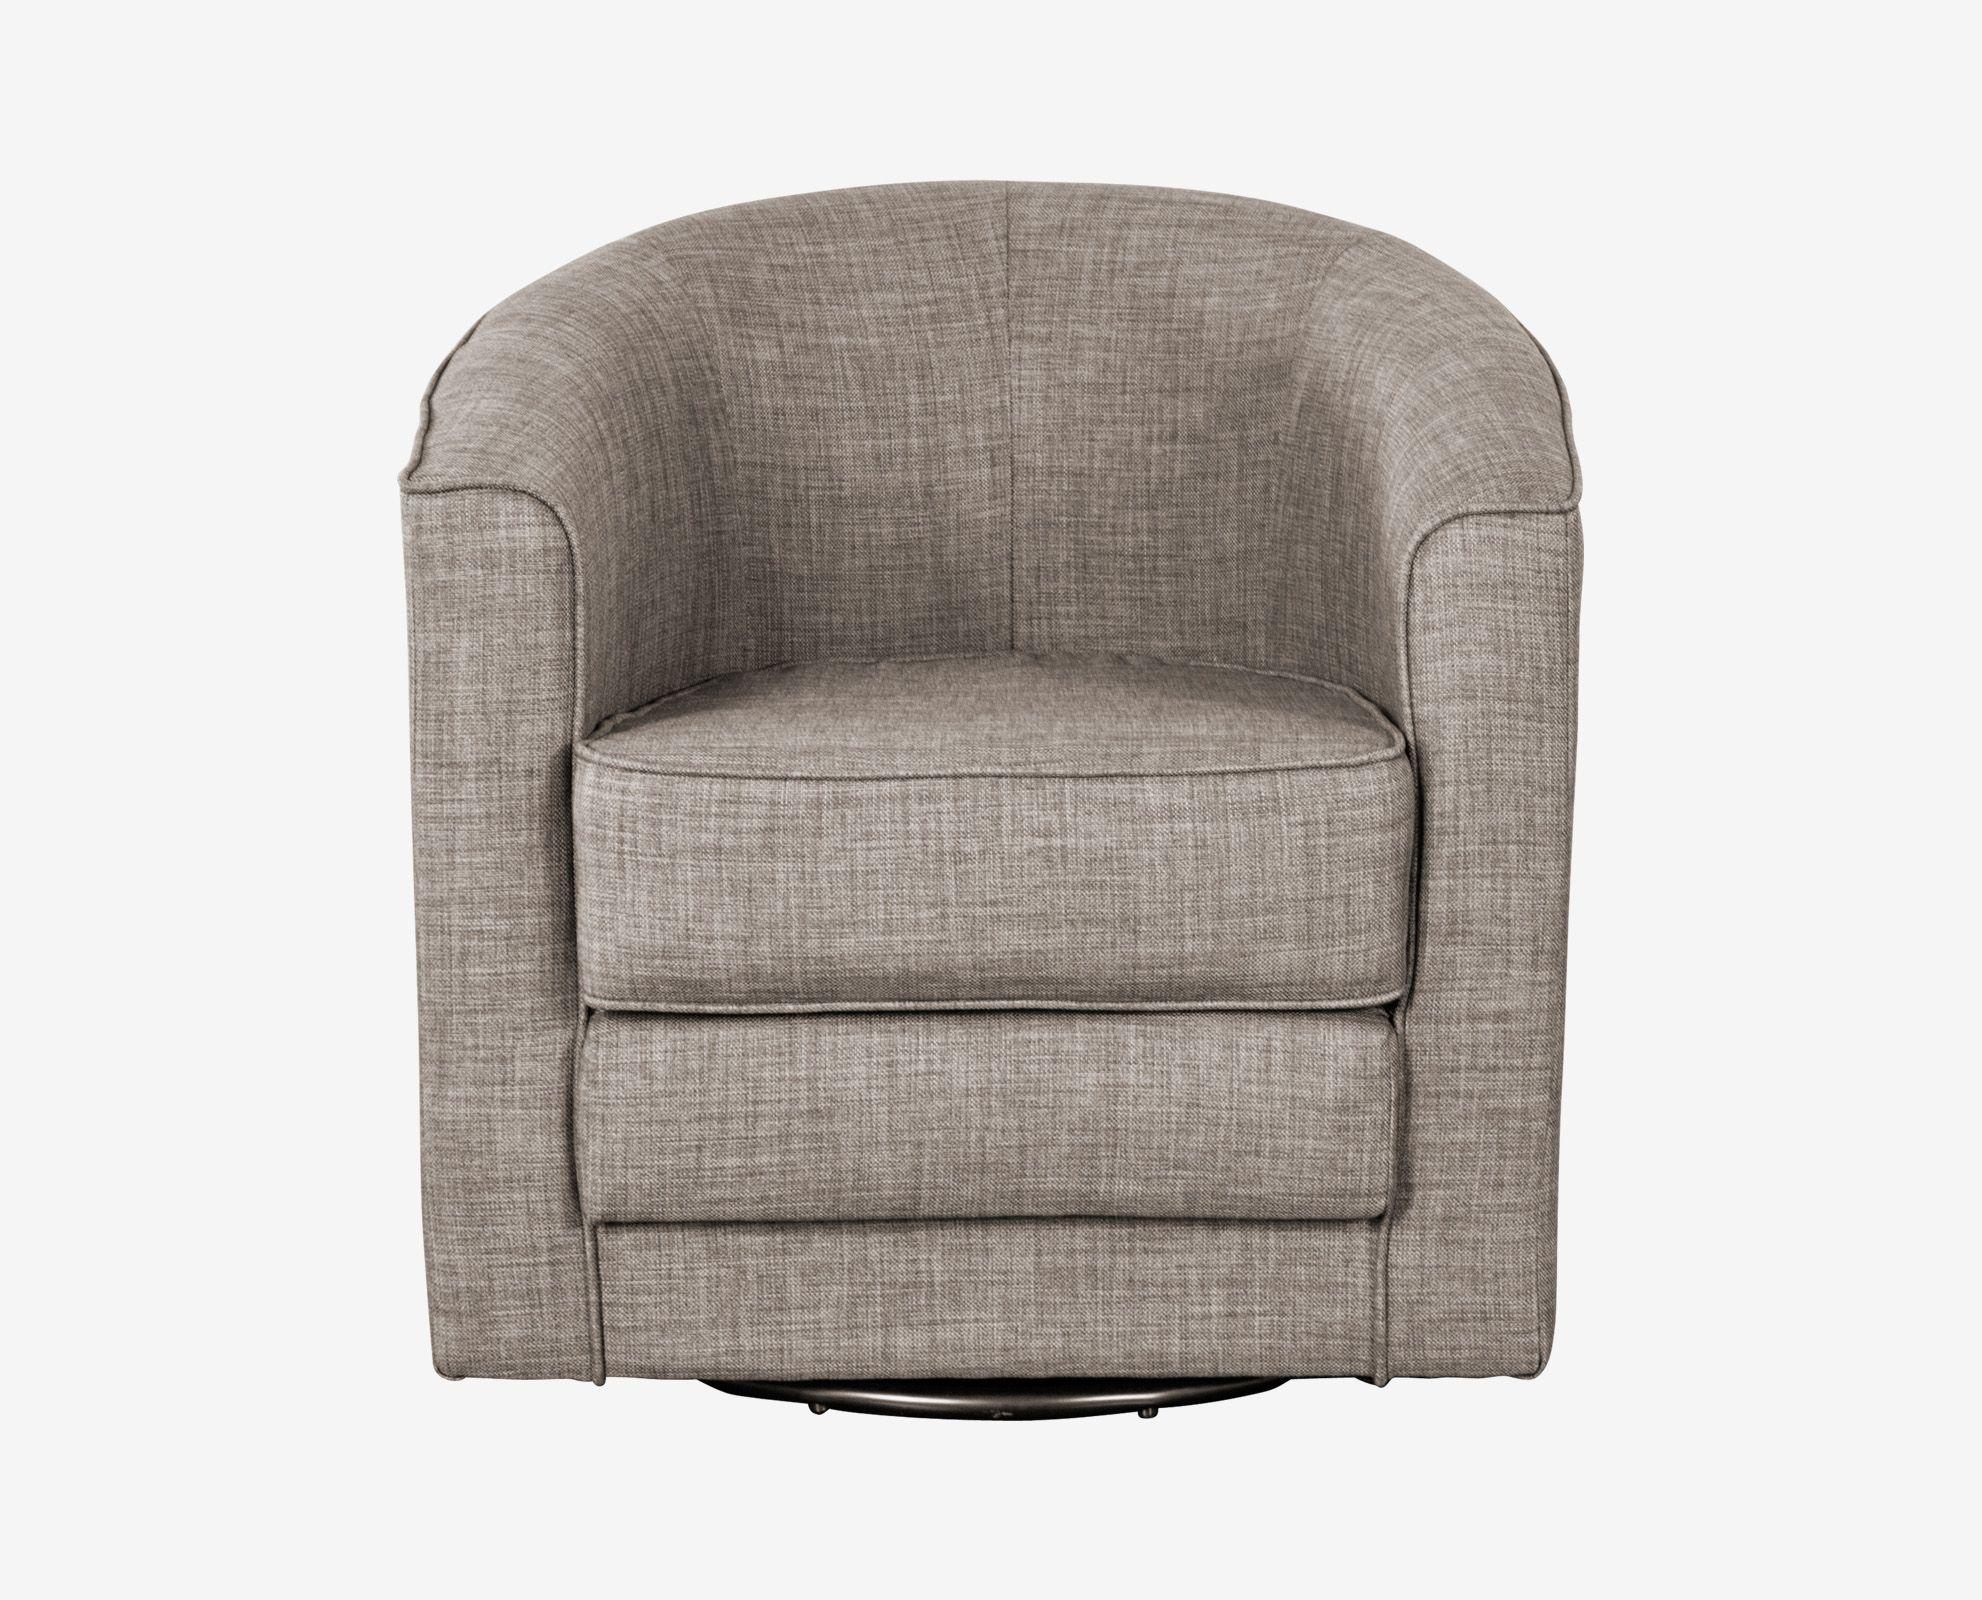 . Theva Swivel Chair   SG 1   Swivel chair  Chair  Living room chairs